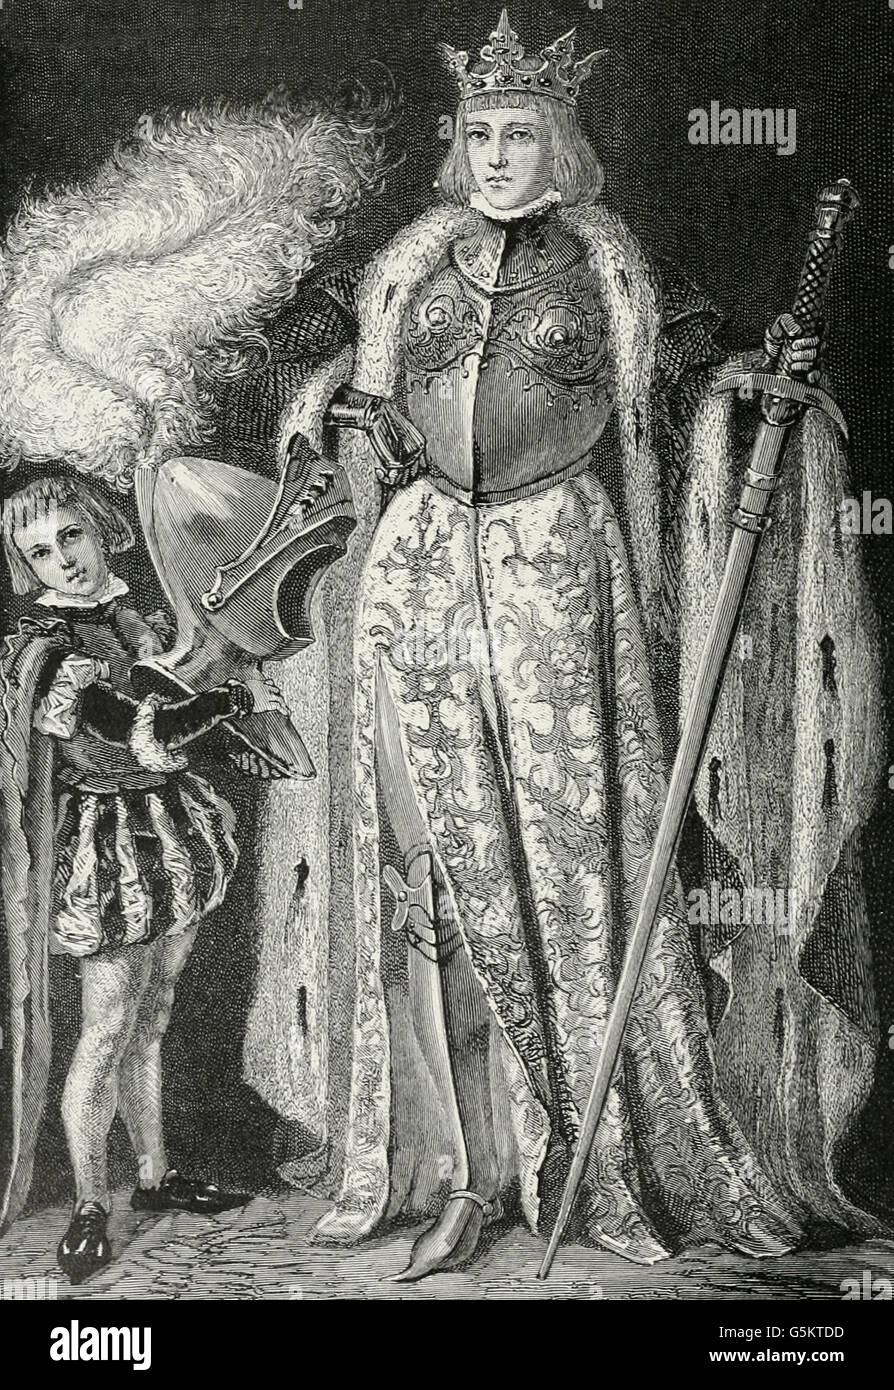 Queen Isabella in her armor Spain circa 1490 - Stock Image  sc 1 st  Alamy & Queen Isabella Of Spain Stock Photos u0026 Queen Isabella Of Spain Stock ...